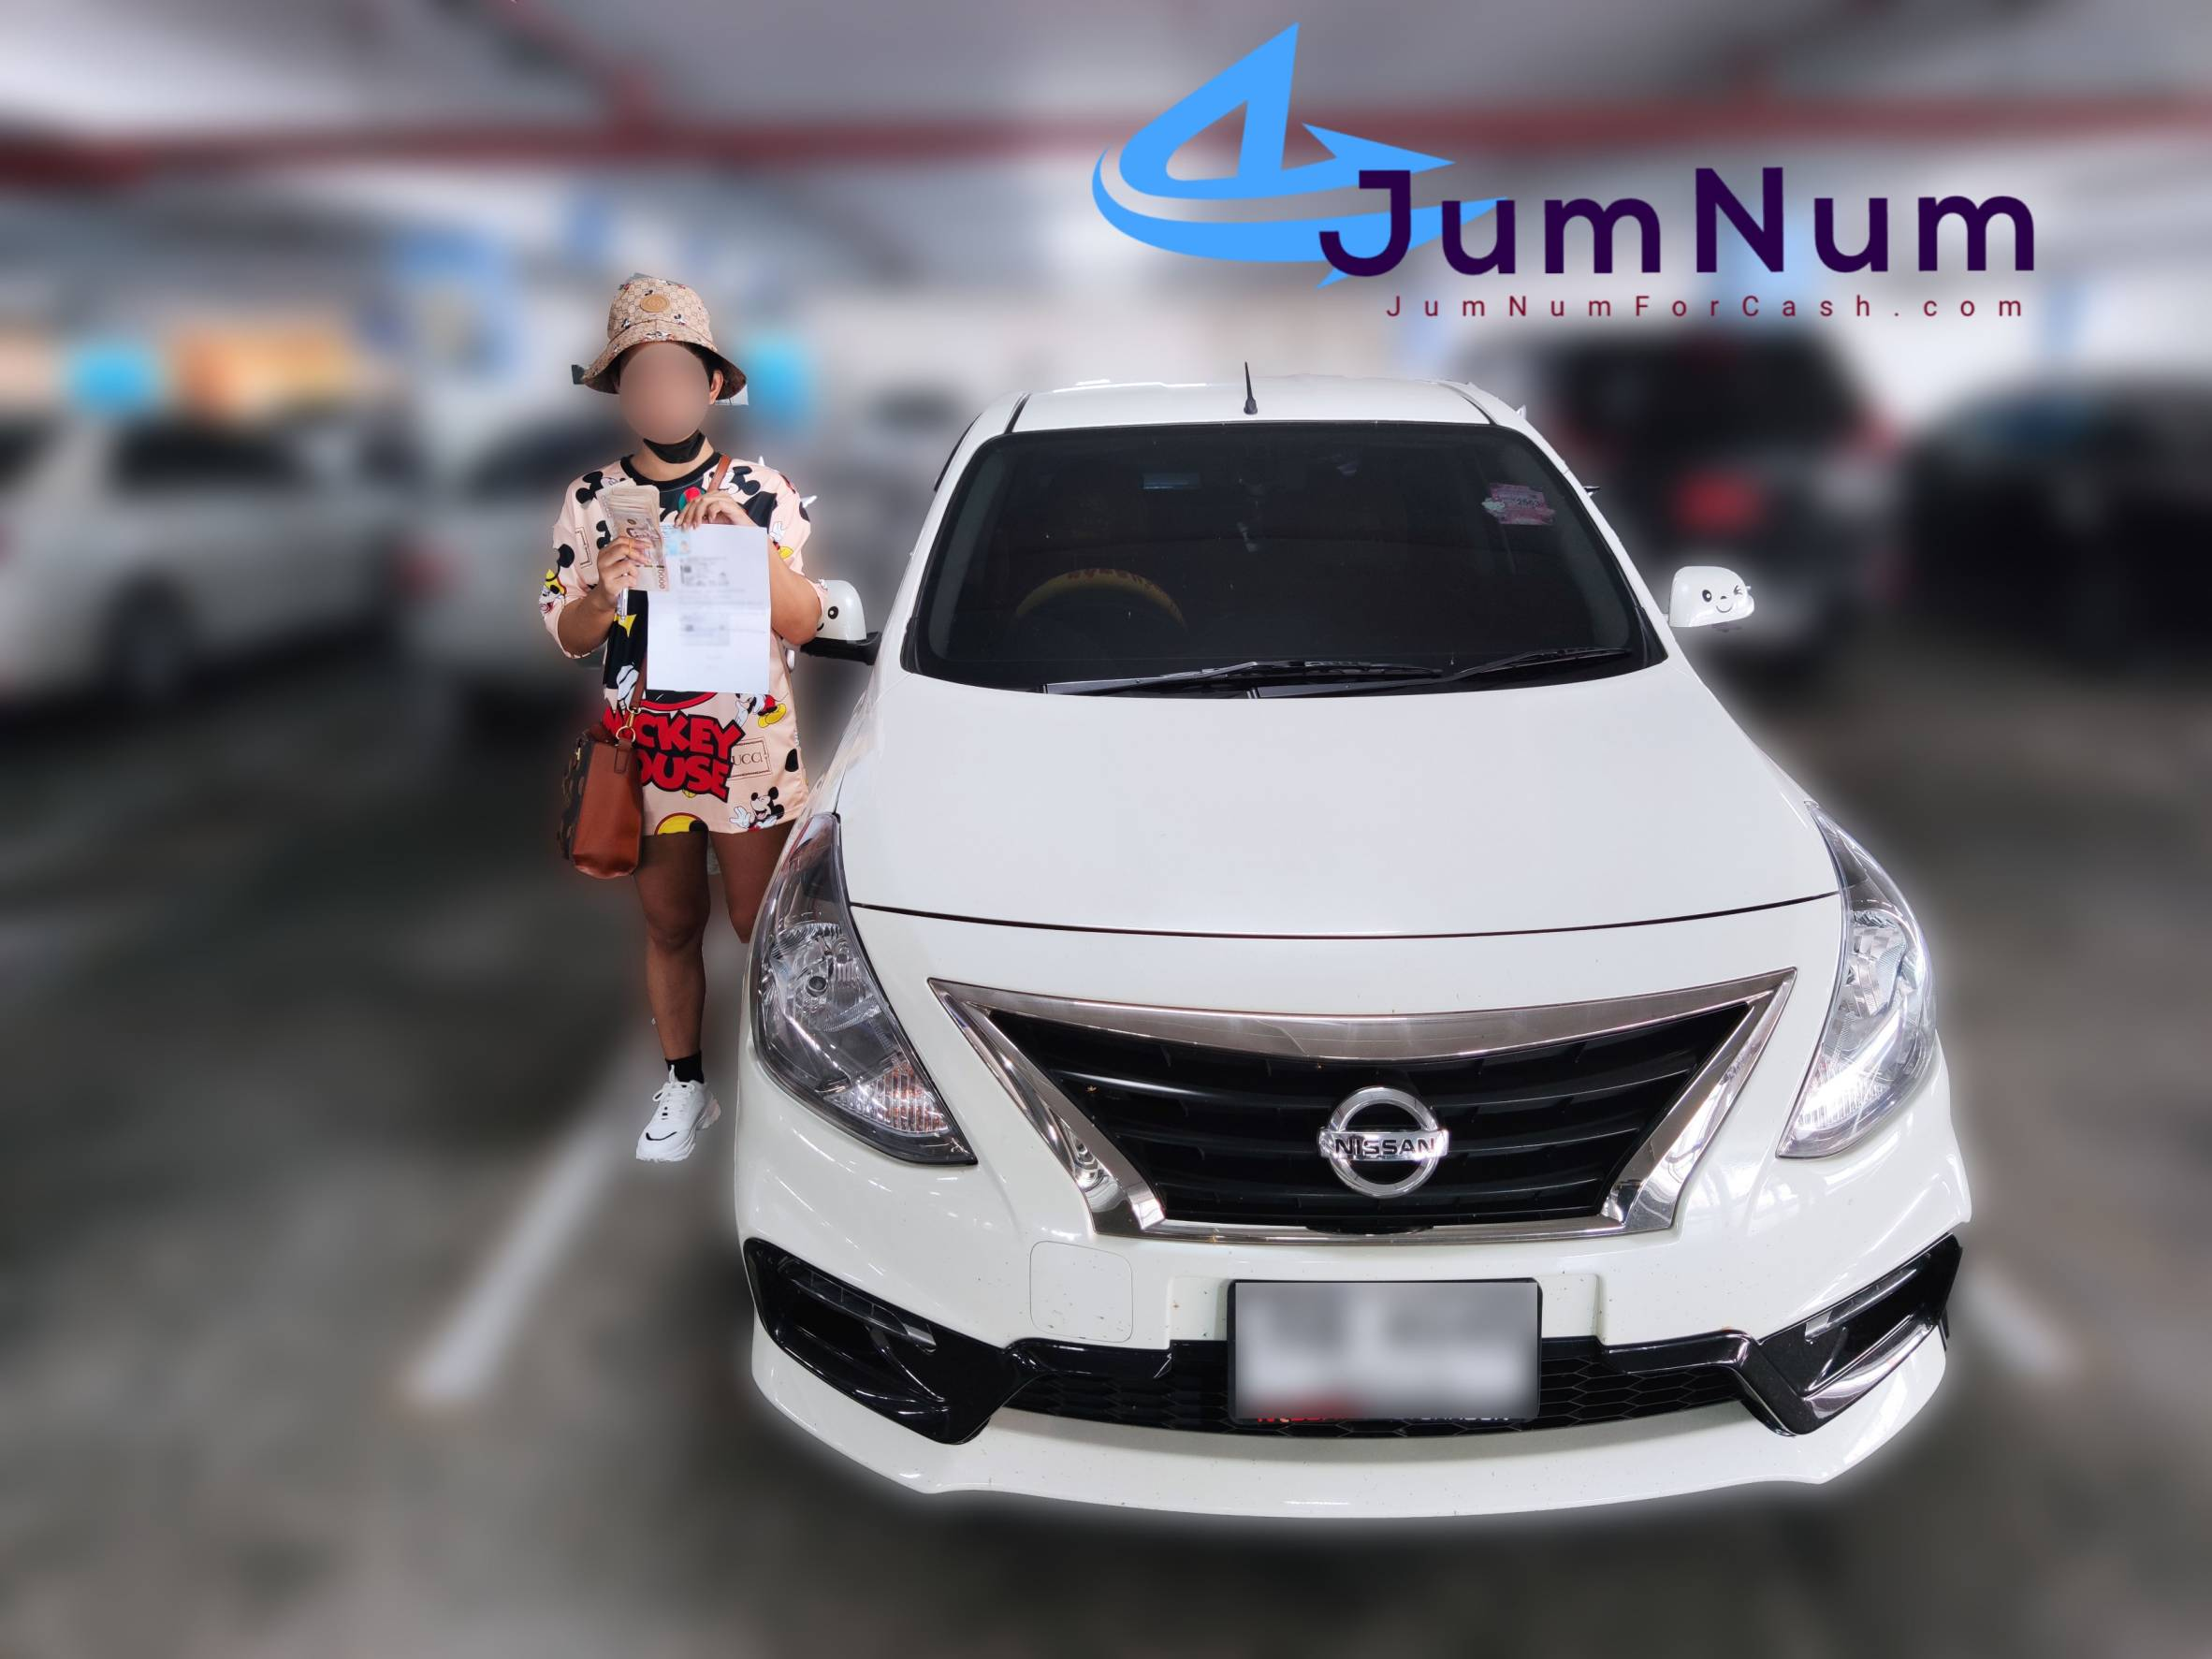 line oa chat 200816 132424 - จำนำรถ Jumnumforcash.com จํานํารถไม่มีเล่ม เราจำนำรถ ทุกรูบแบบ ทุกยี่ห้อ รถใหม่ป้ายแดง รถ SuperCar FEB 1 2021